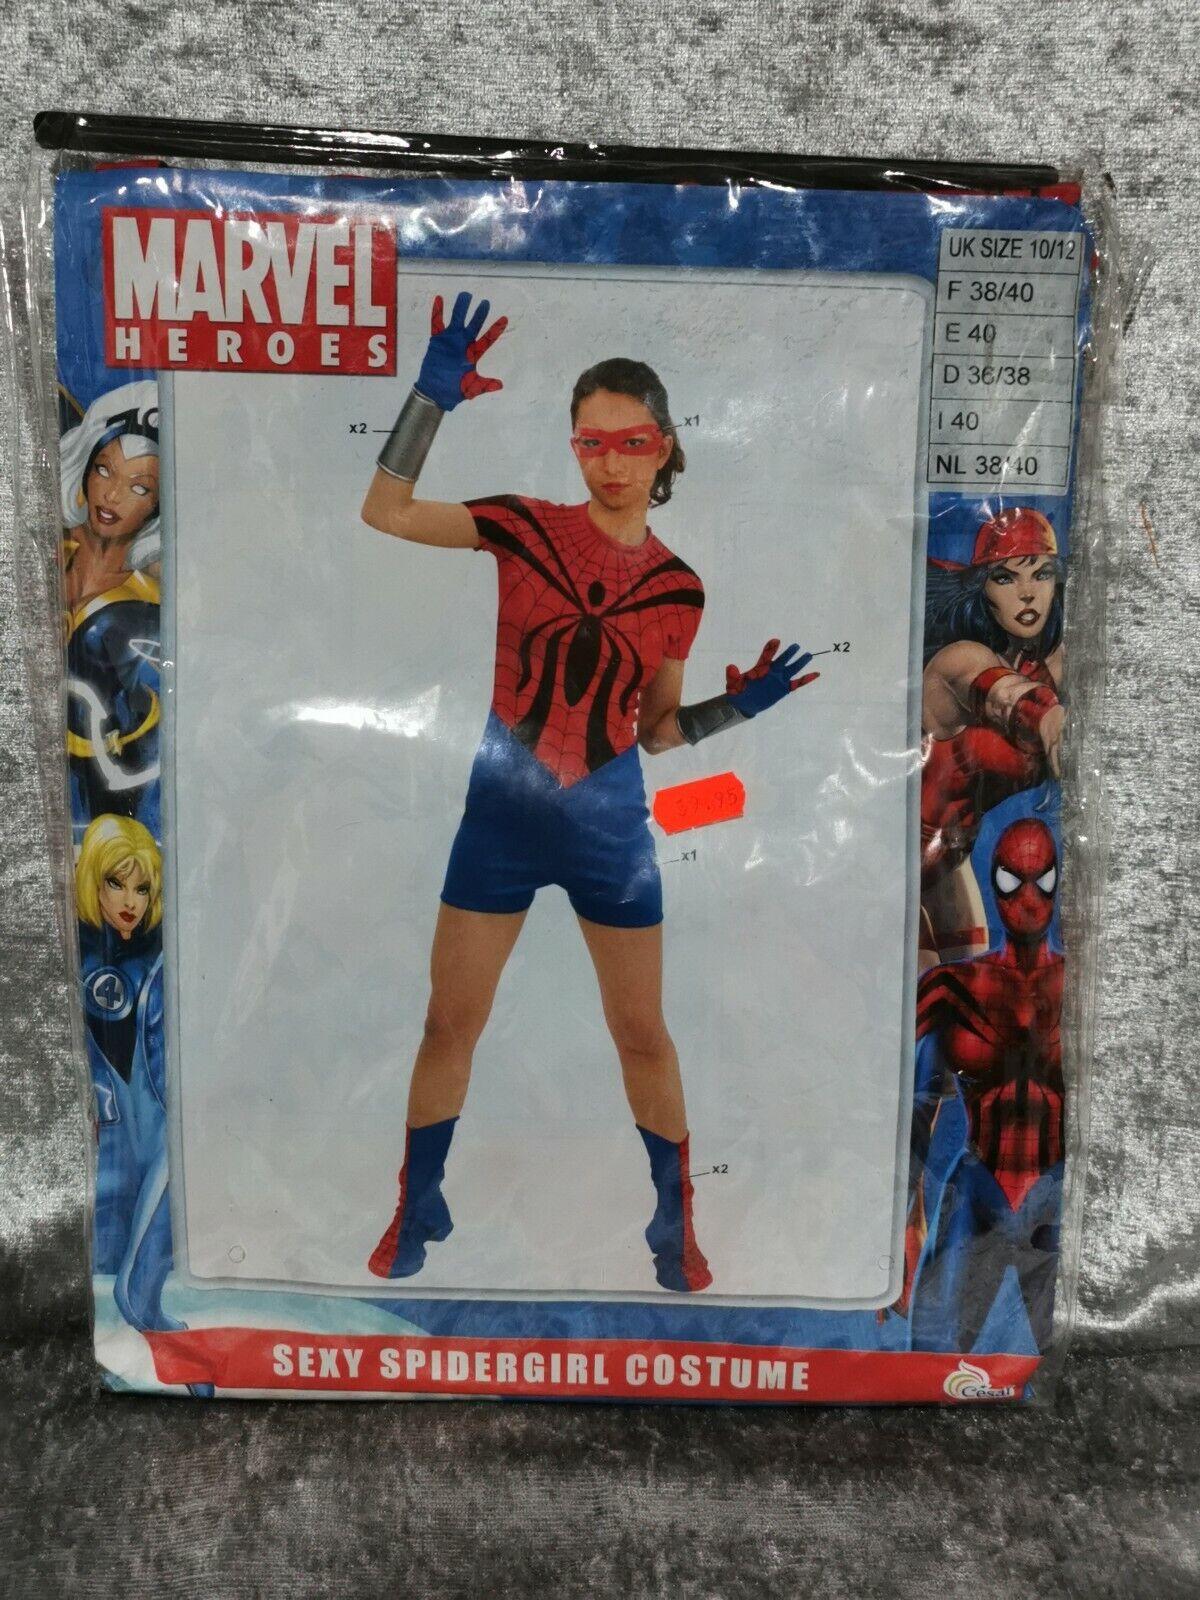 B3 marvels spiderman spidergirl costume fancy dress cosplay adults UK 10-12